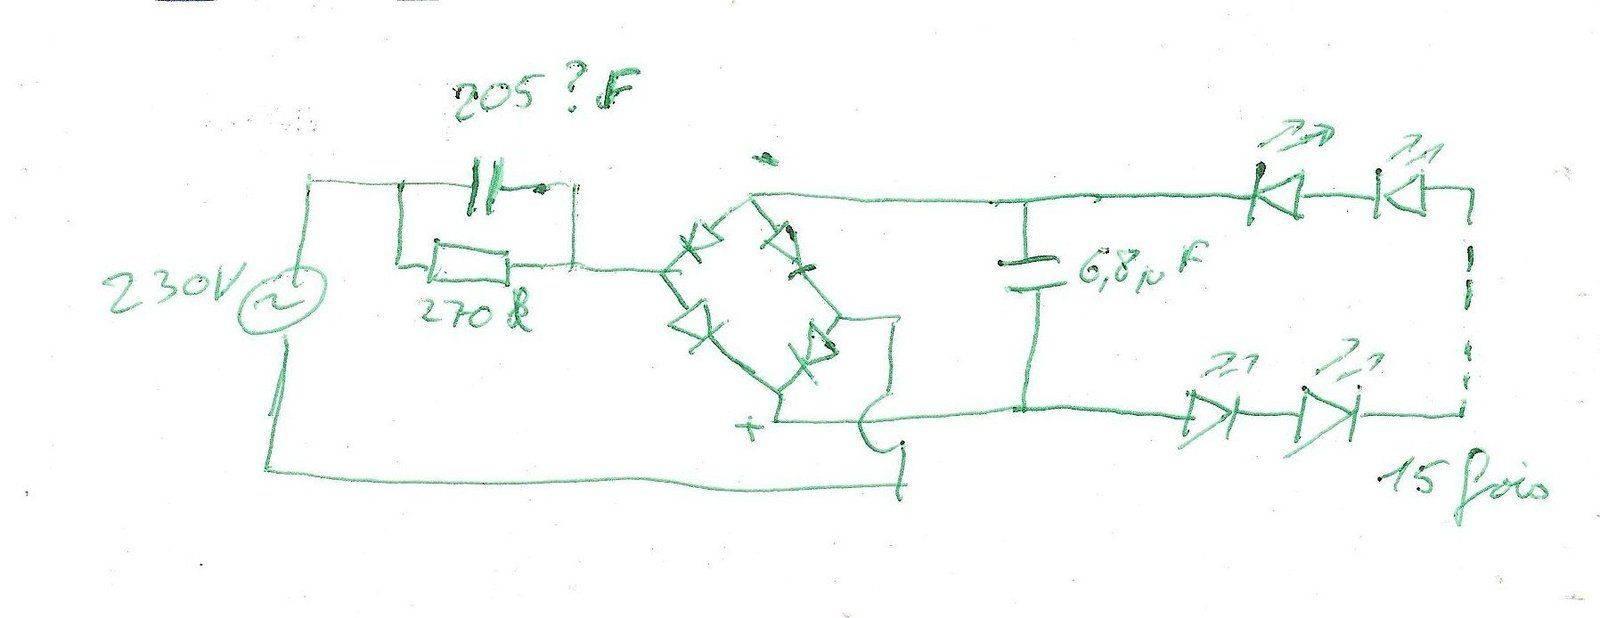 Image (3).jpg